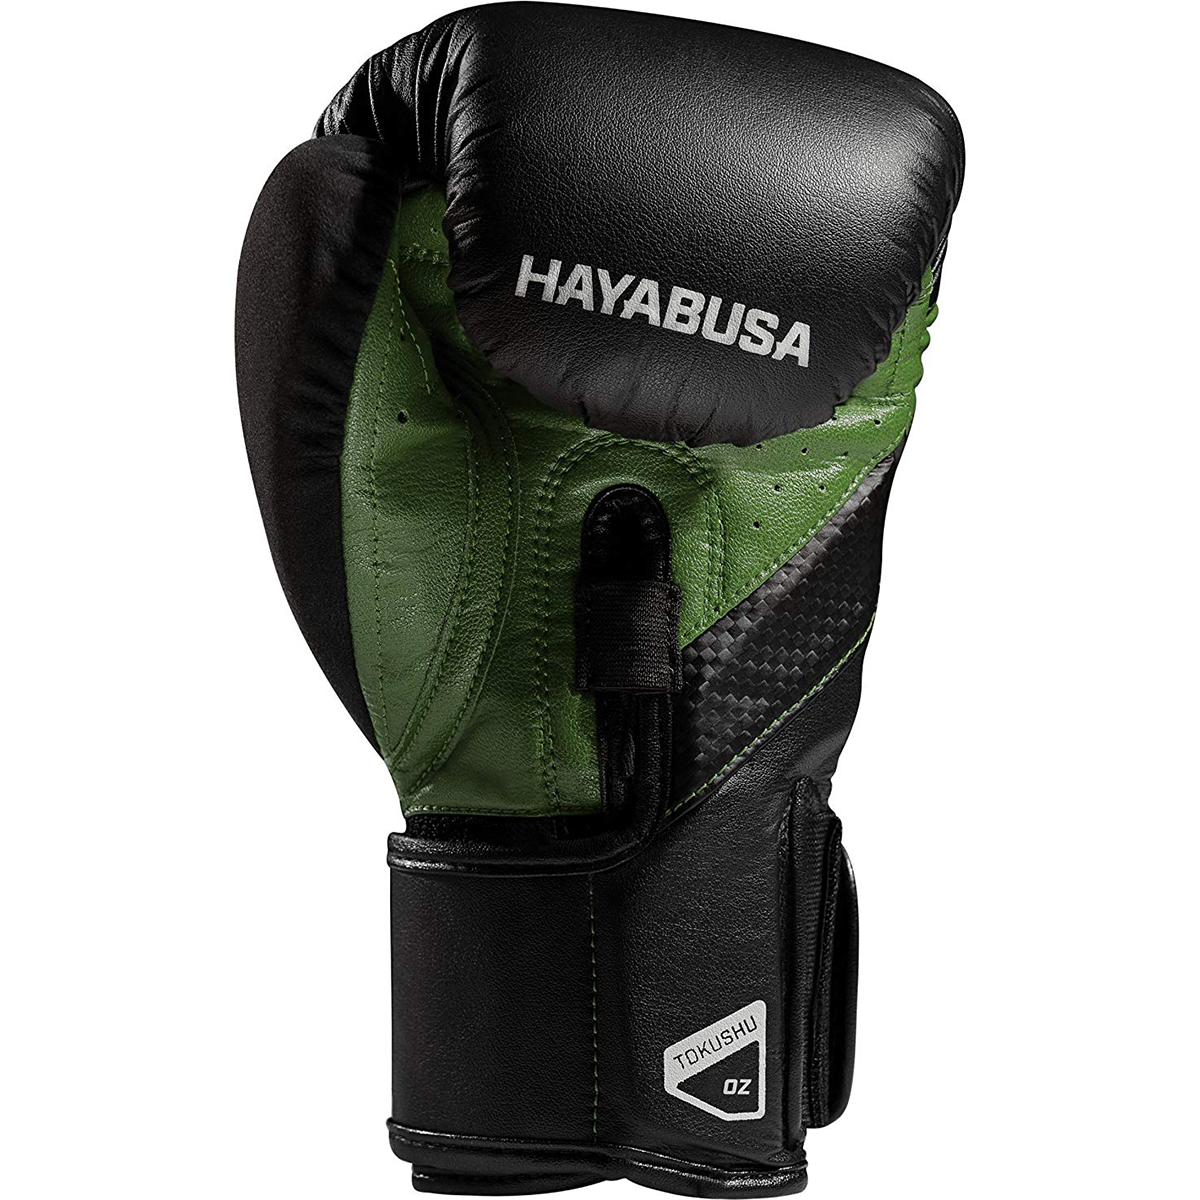 Hayabusa-T3-Dual-X-Hook-and-Loop-Closure-Vylar-Leather-Training-Boxing-Gloves thumbnail 12